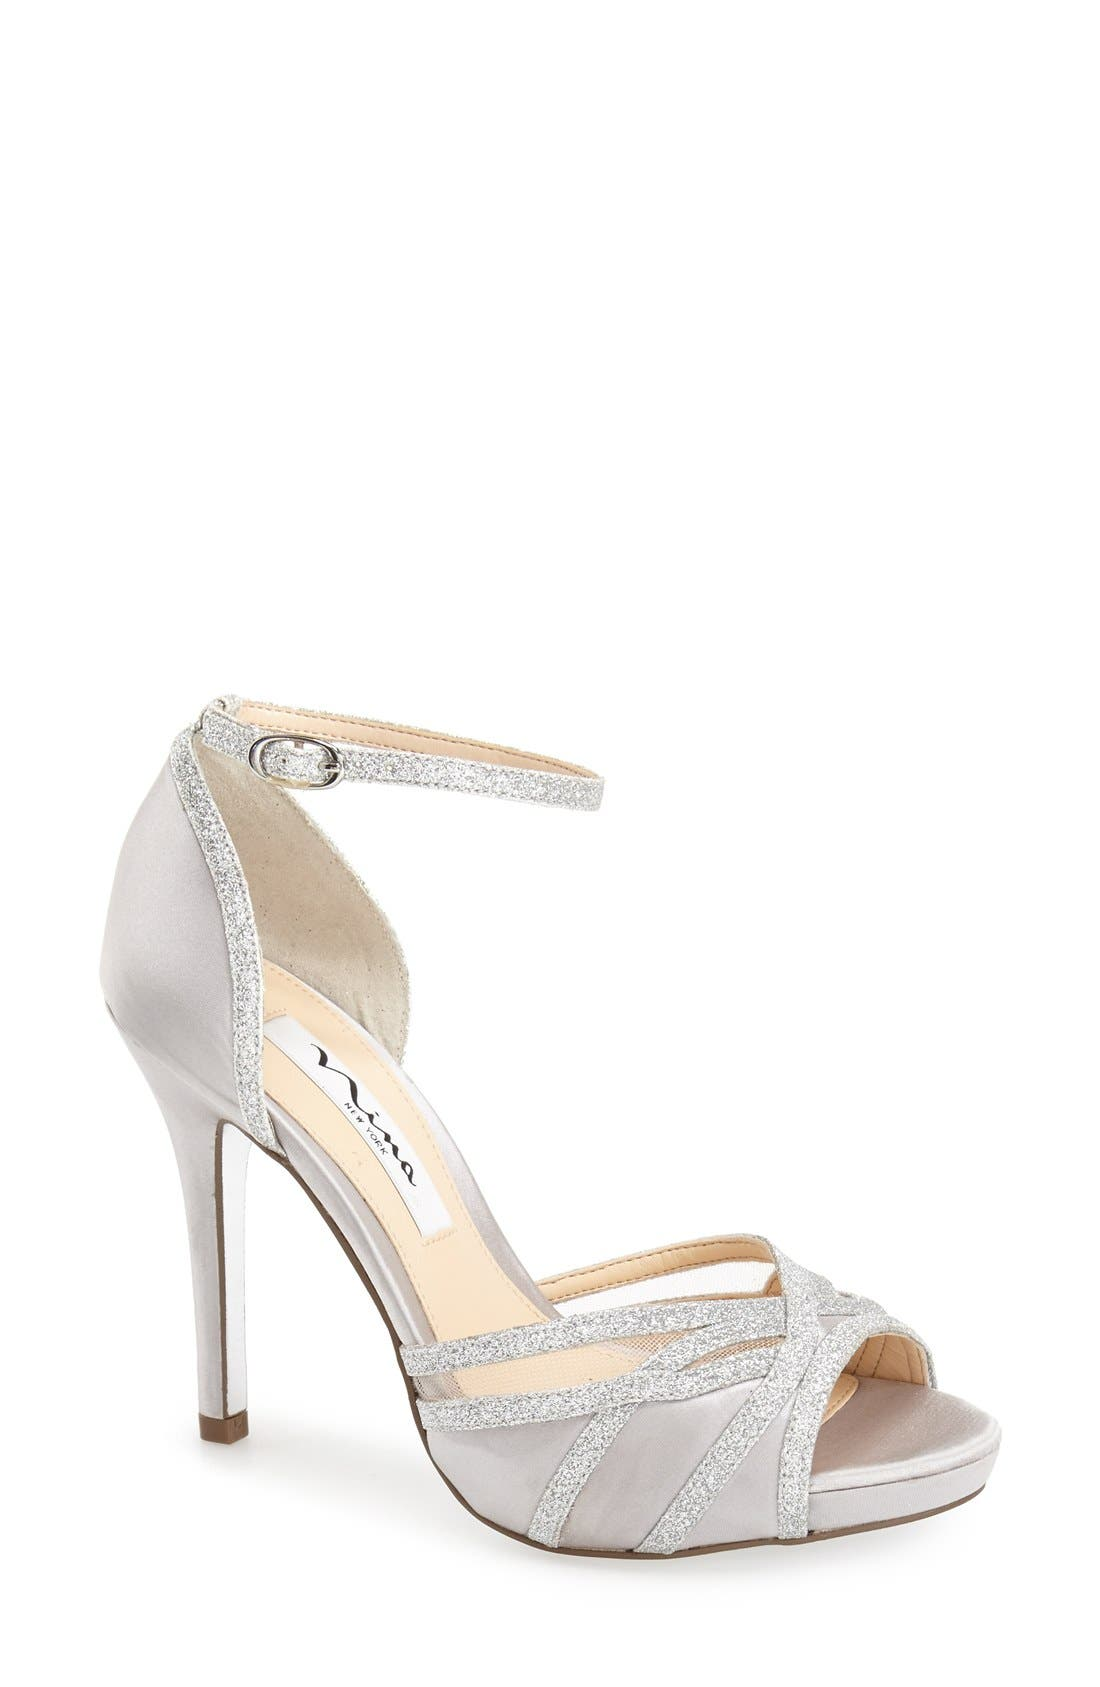 Alternate Image 1 Selected - Nina 'Kerstin' Ankle Strap Sandal (Women)